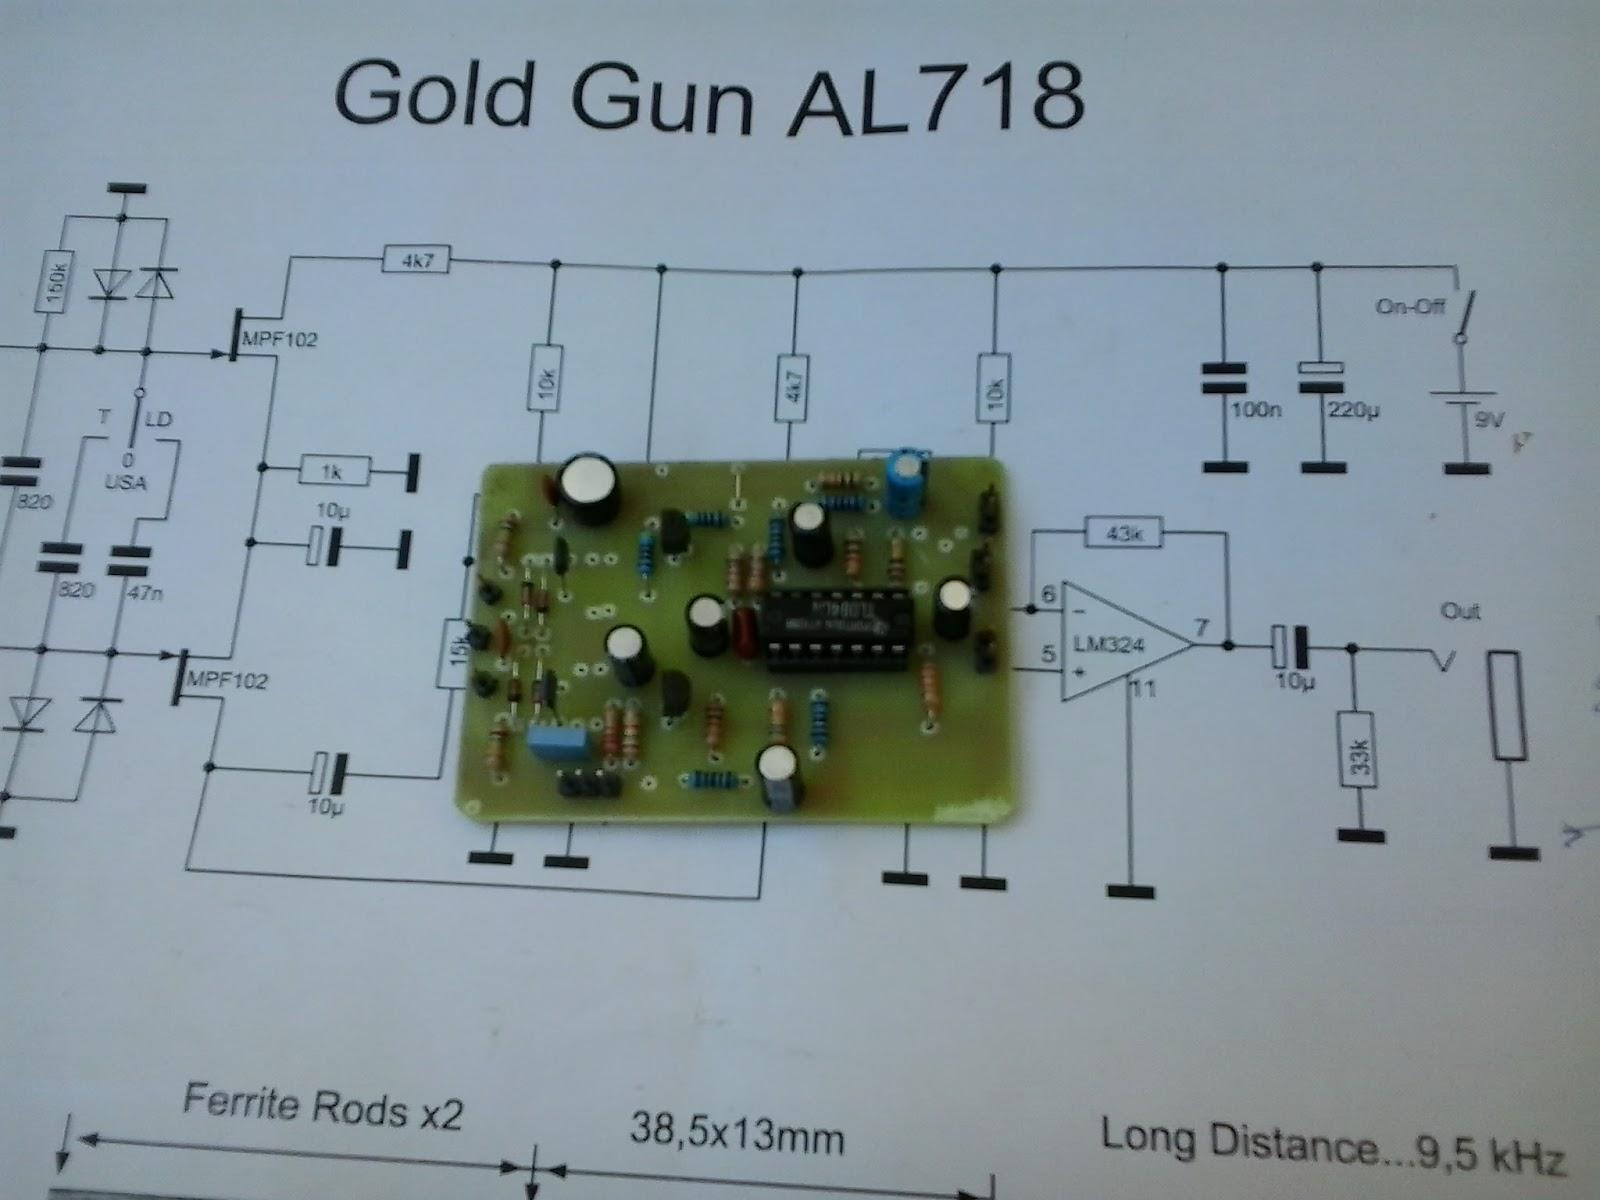 Gold Gun Al718 Pistol Detector Schematic Page 2 Longrangelocators Forums